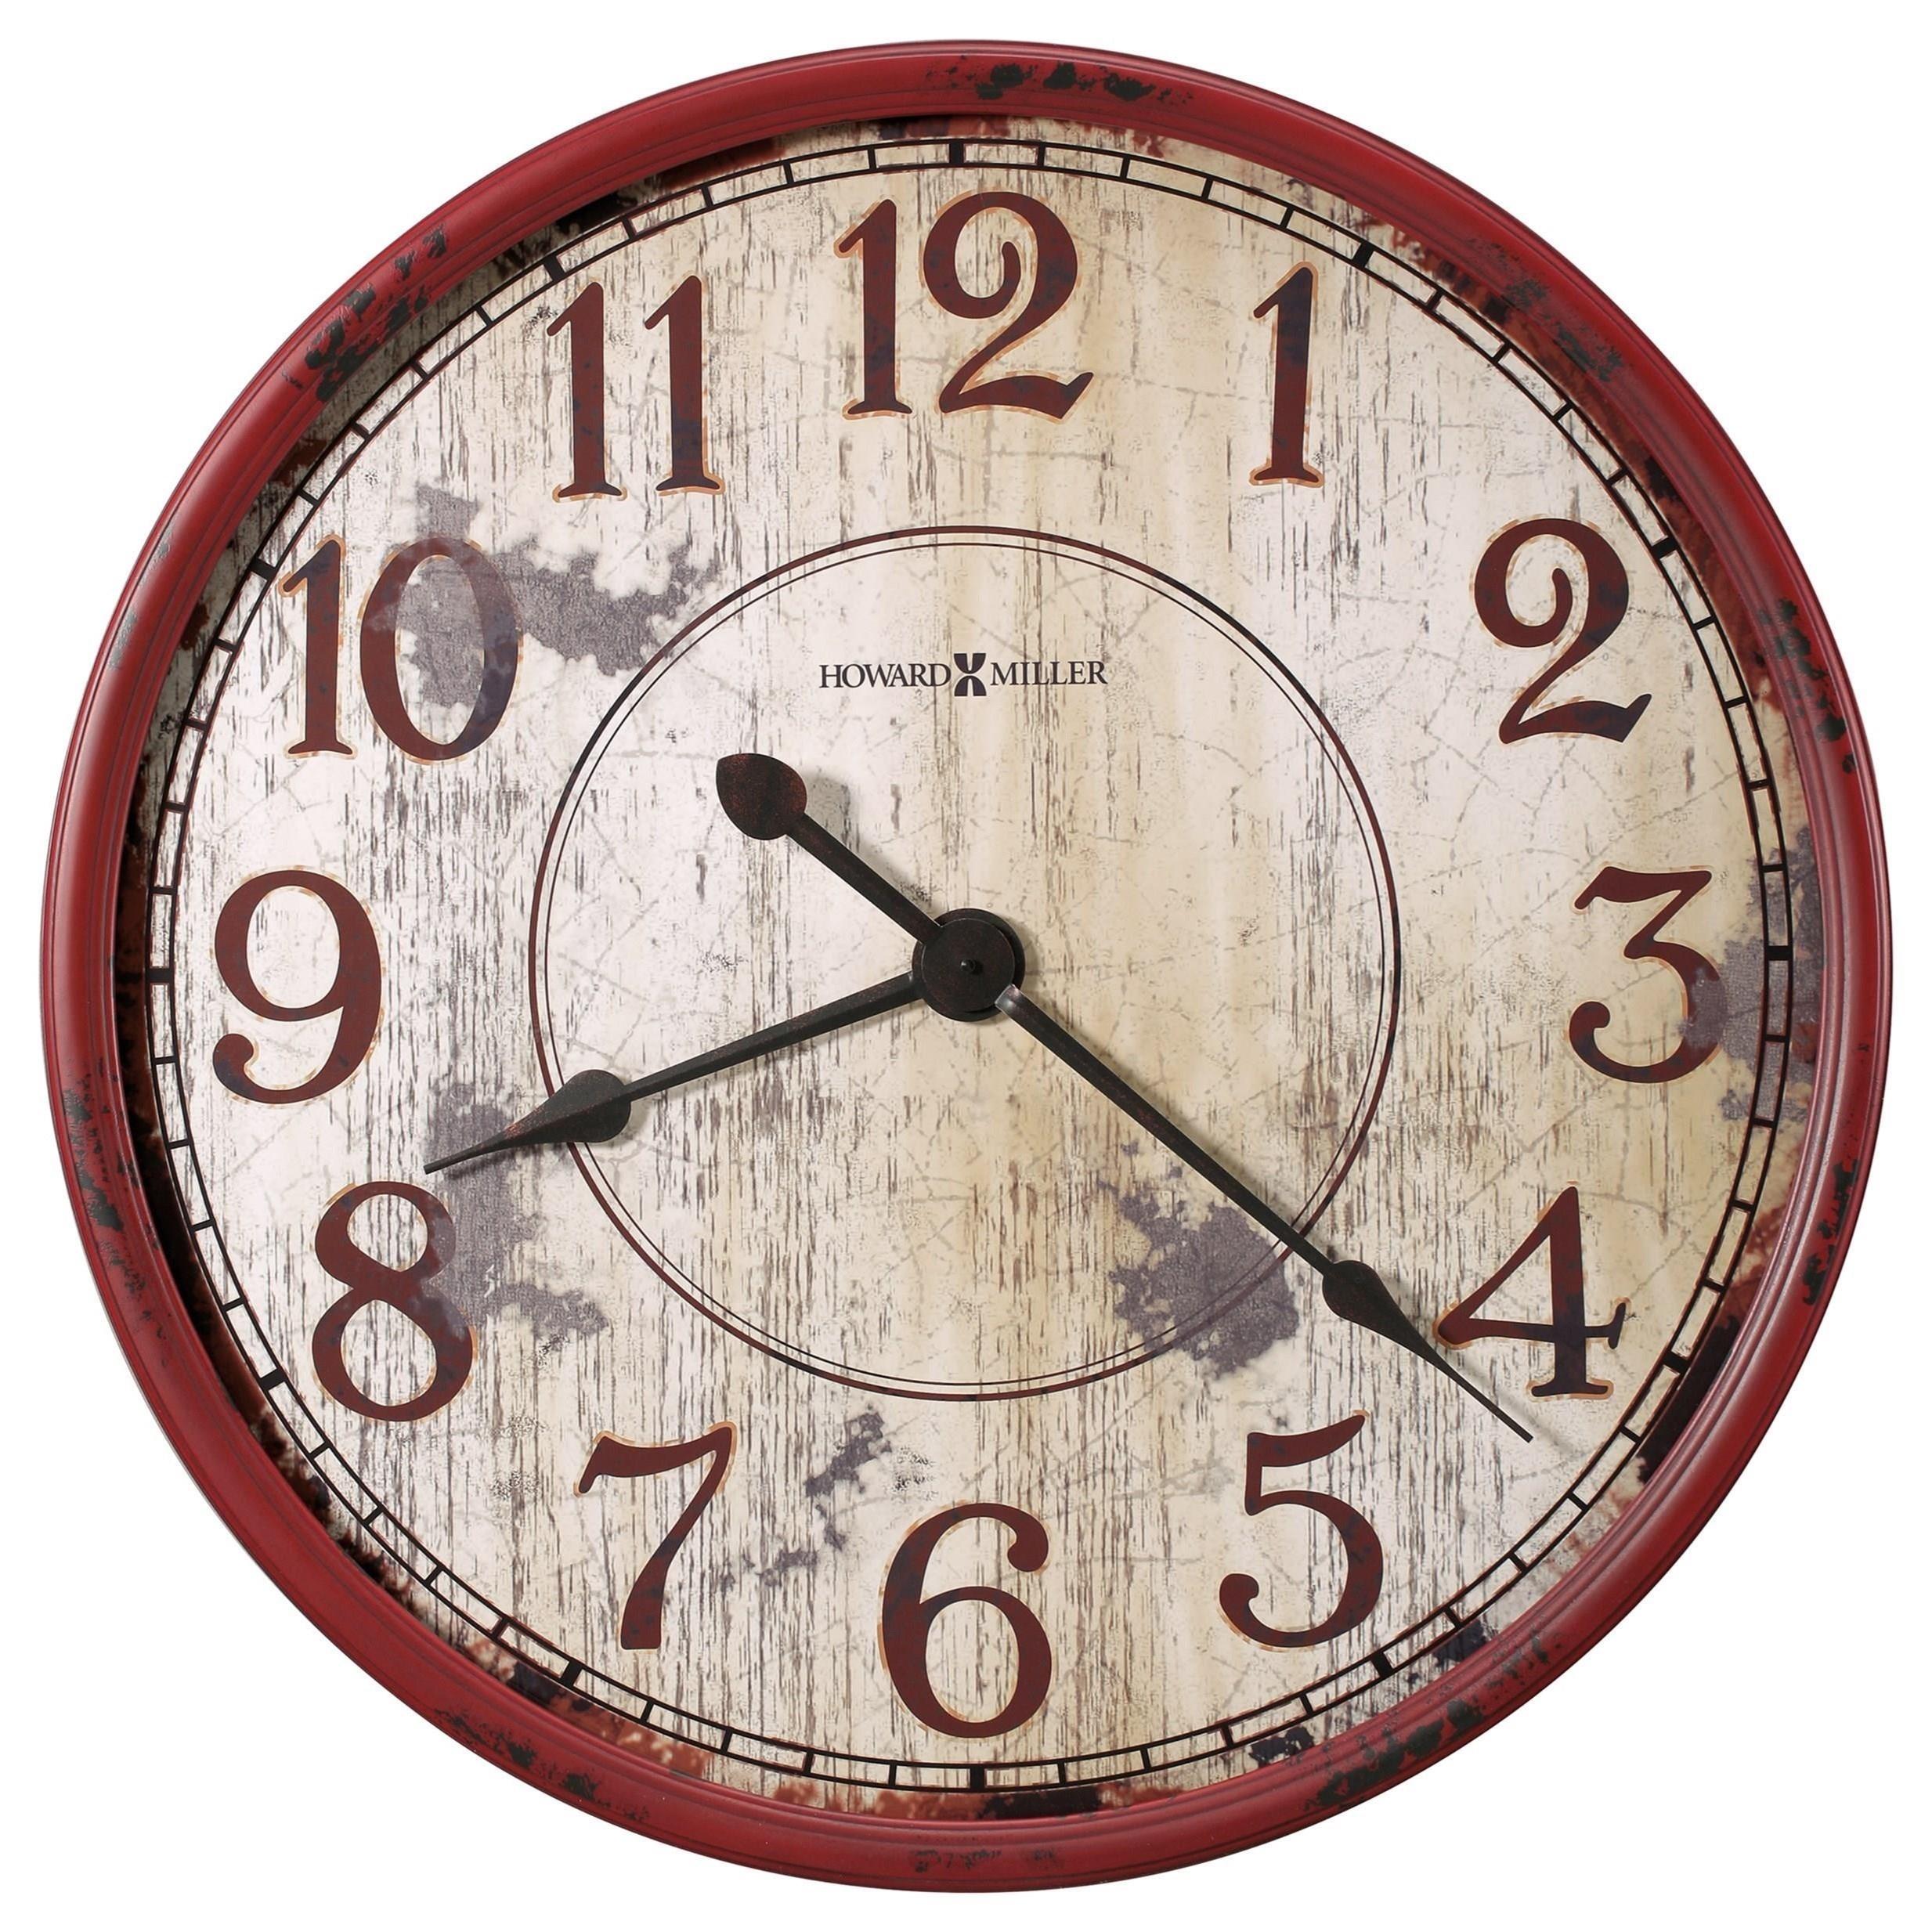 Wall Clocks Back 40 Wall Clock by Howard Miller at Lindy's Furniture Company